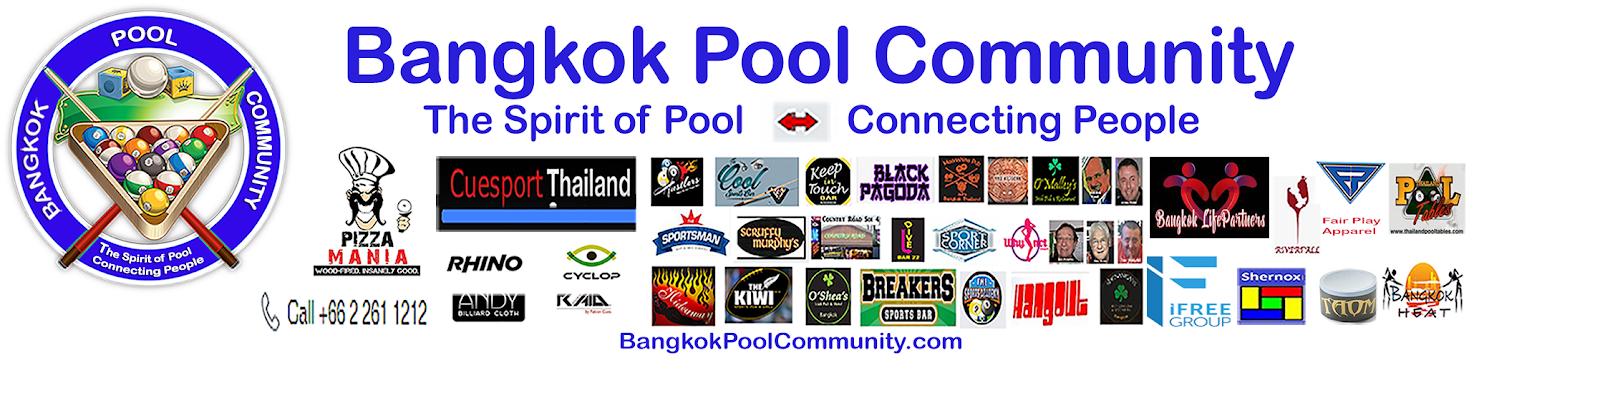 Bangkok Pool Community